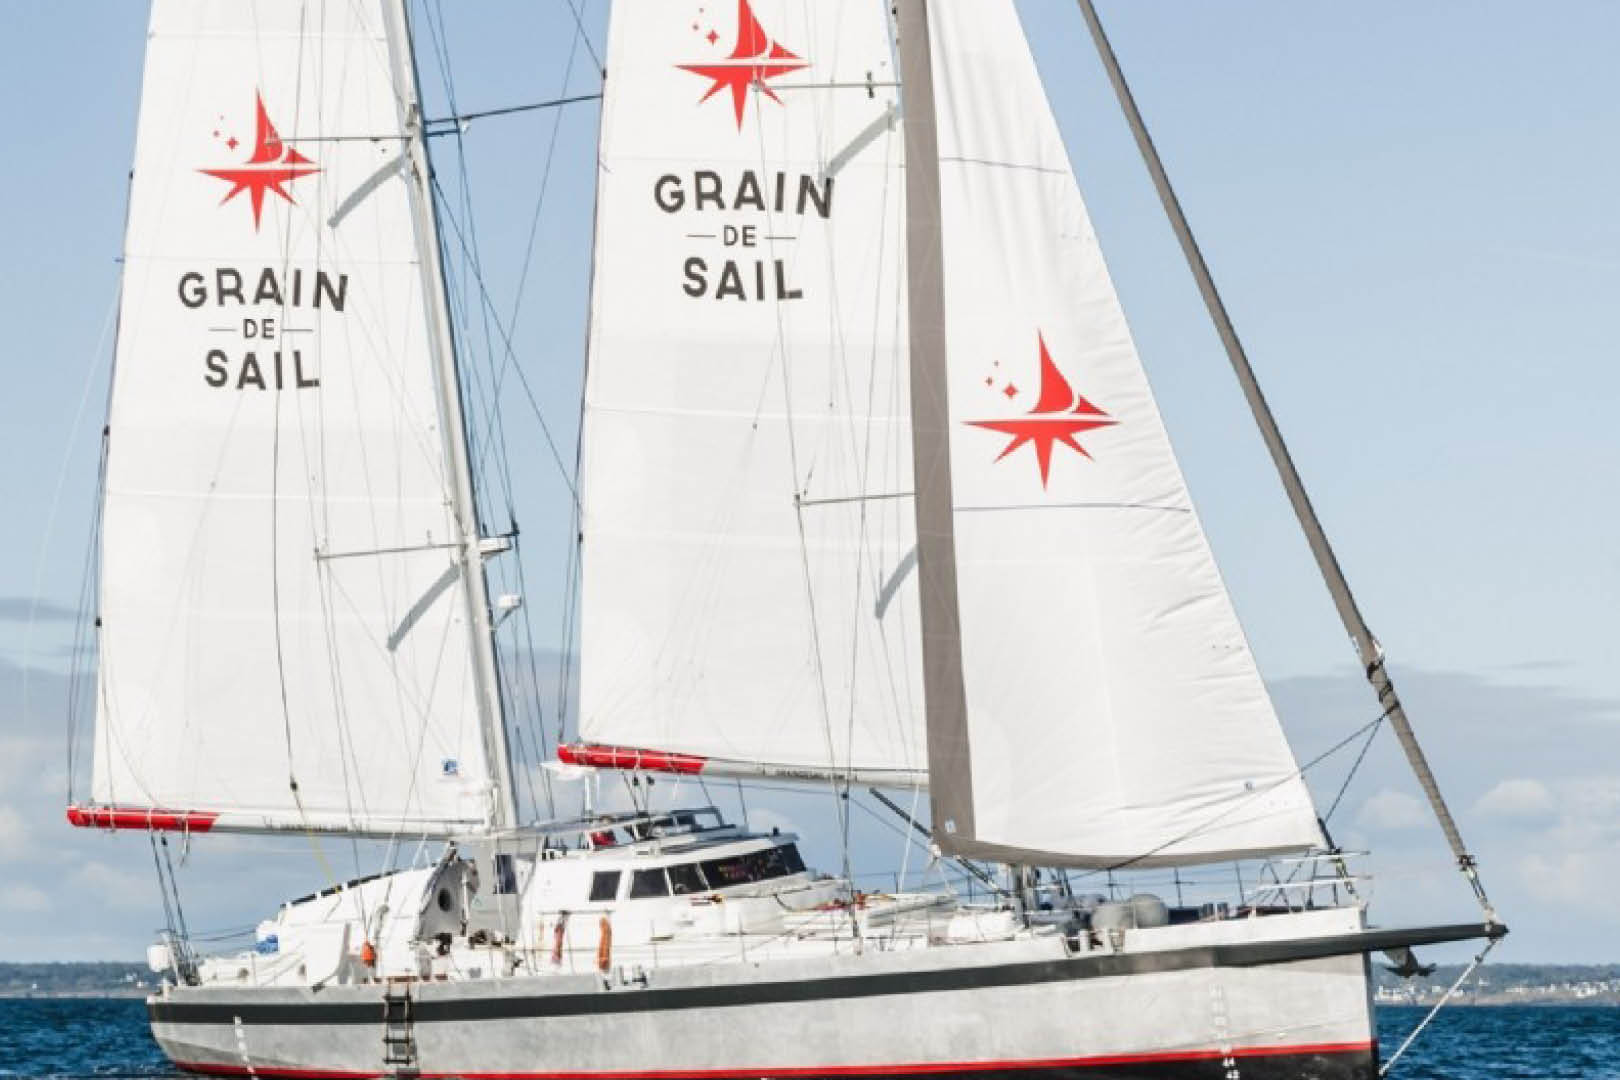 transport-fluvial-grain-de-sail